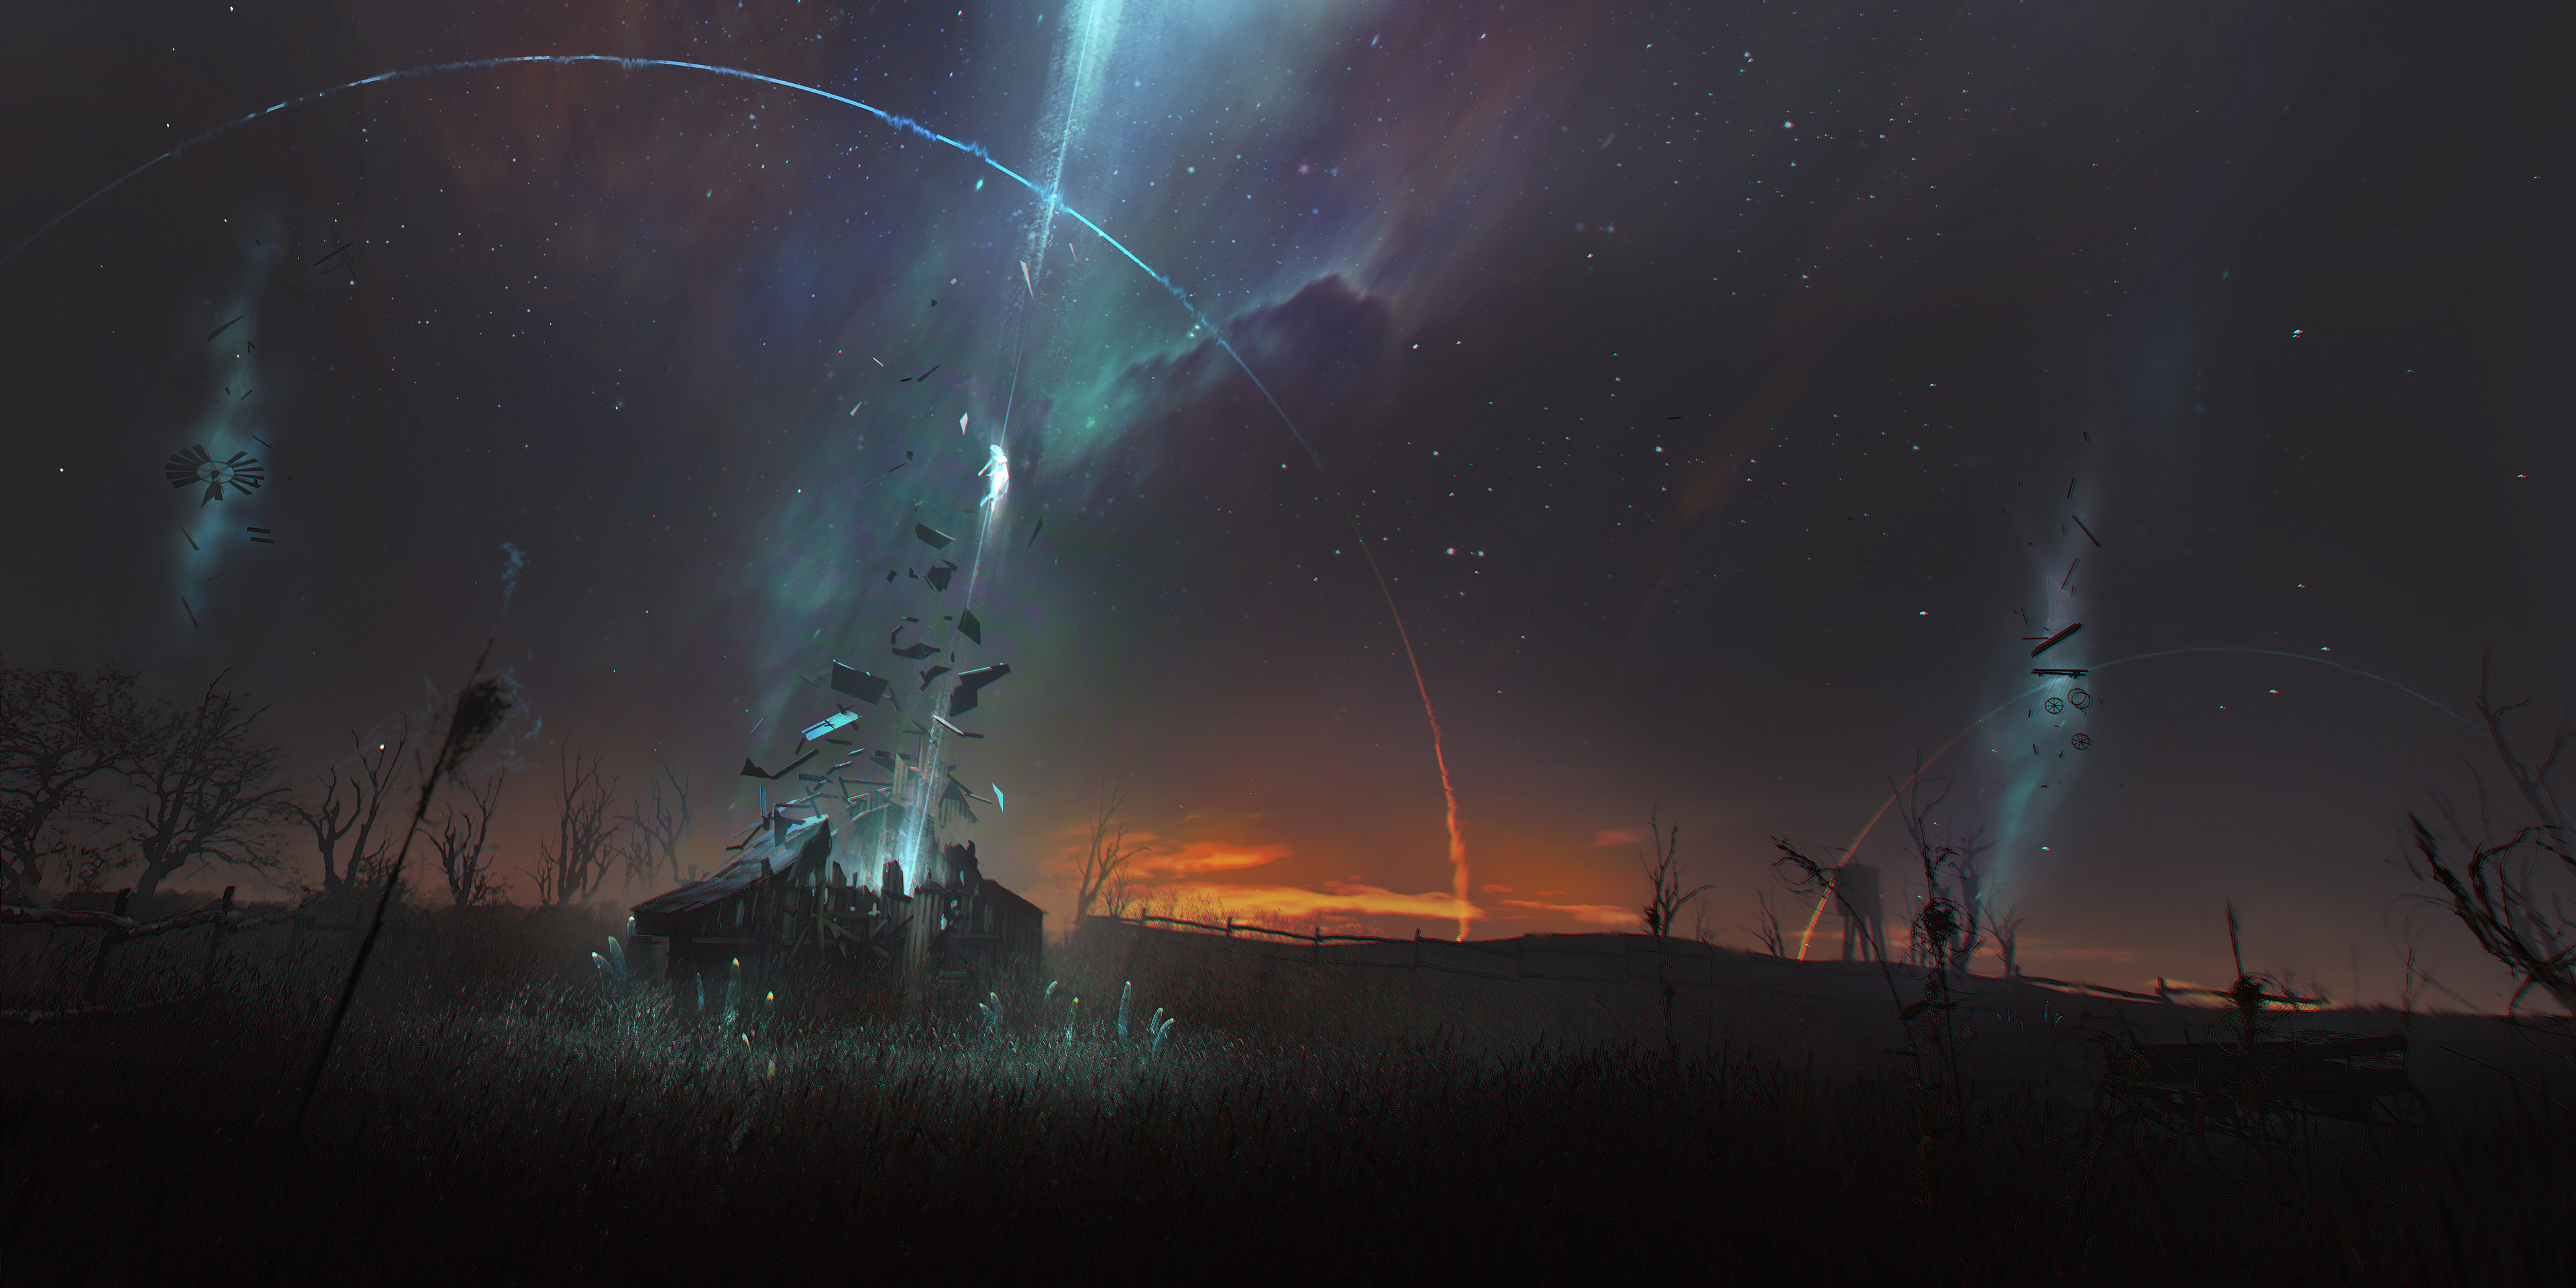 General 3840x1920 David Metzger digital art fantasy art windmill alien abduction stars space sunset aurorae field